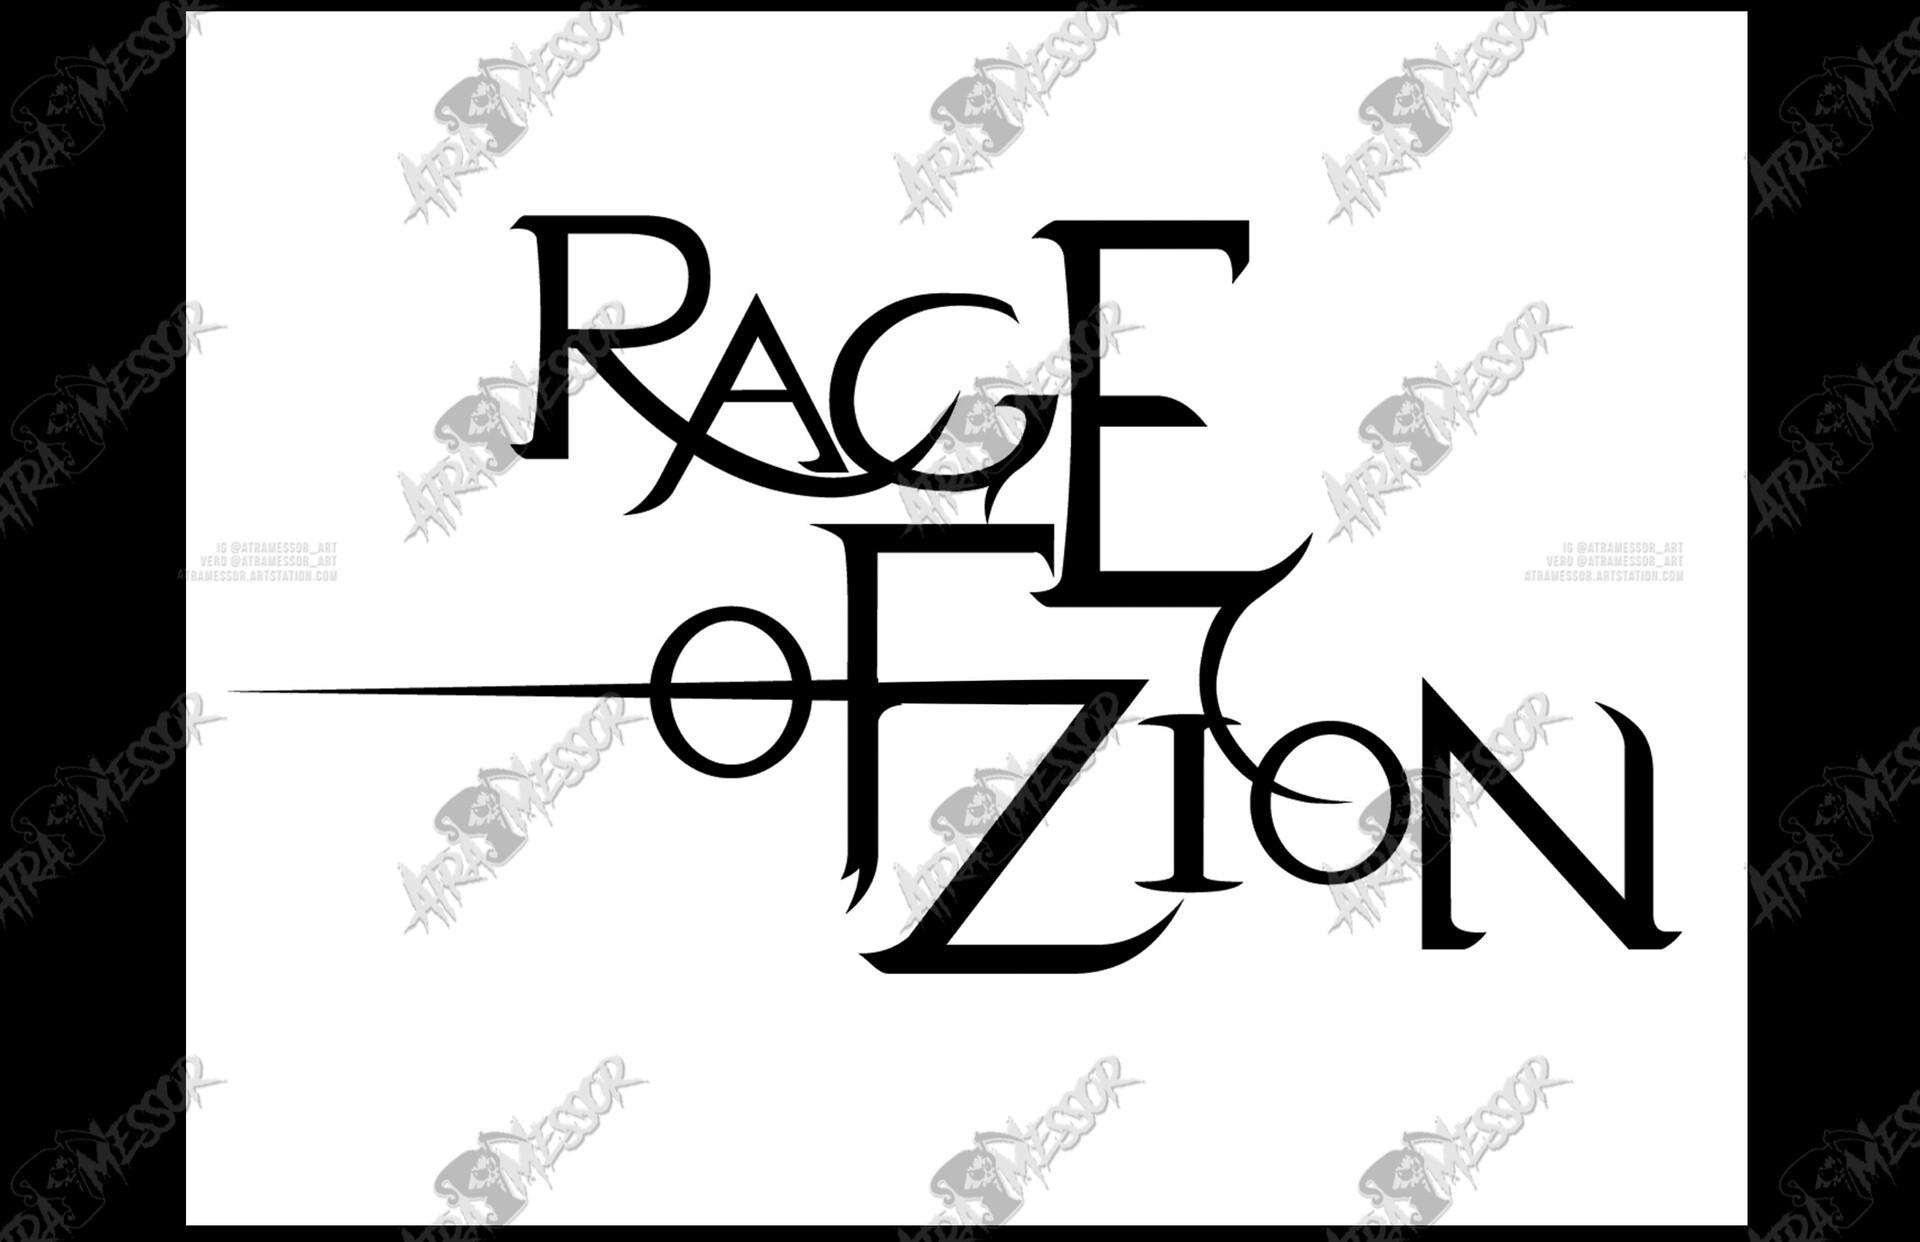 Rage of Zion logo (band)